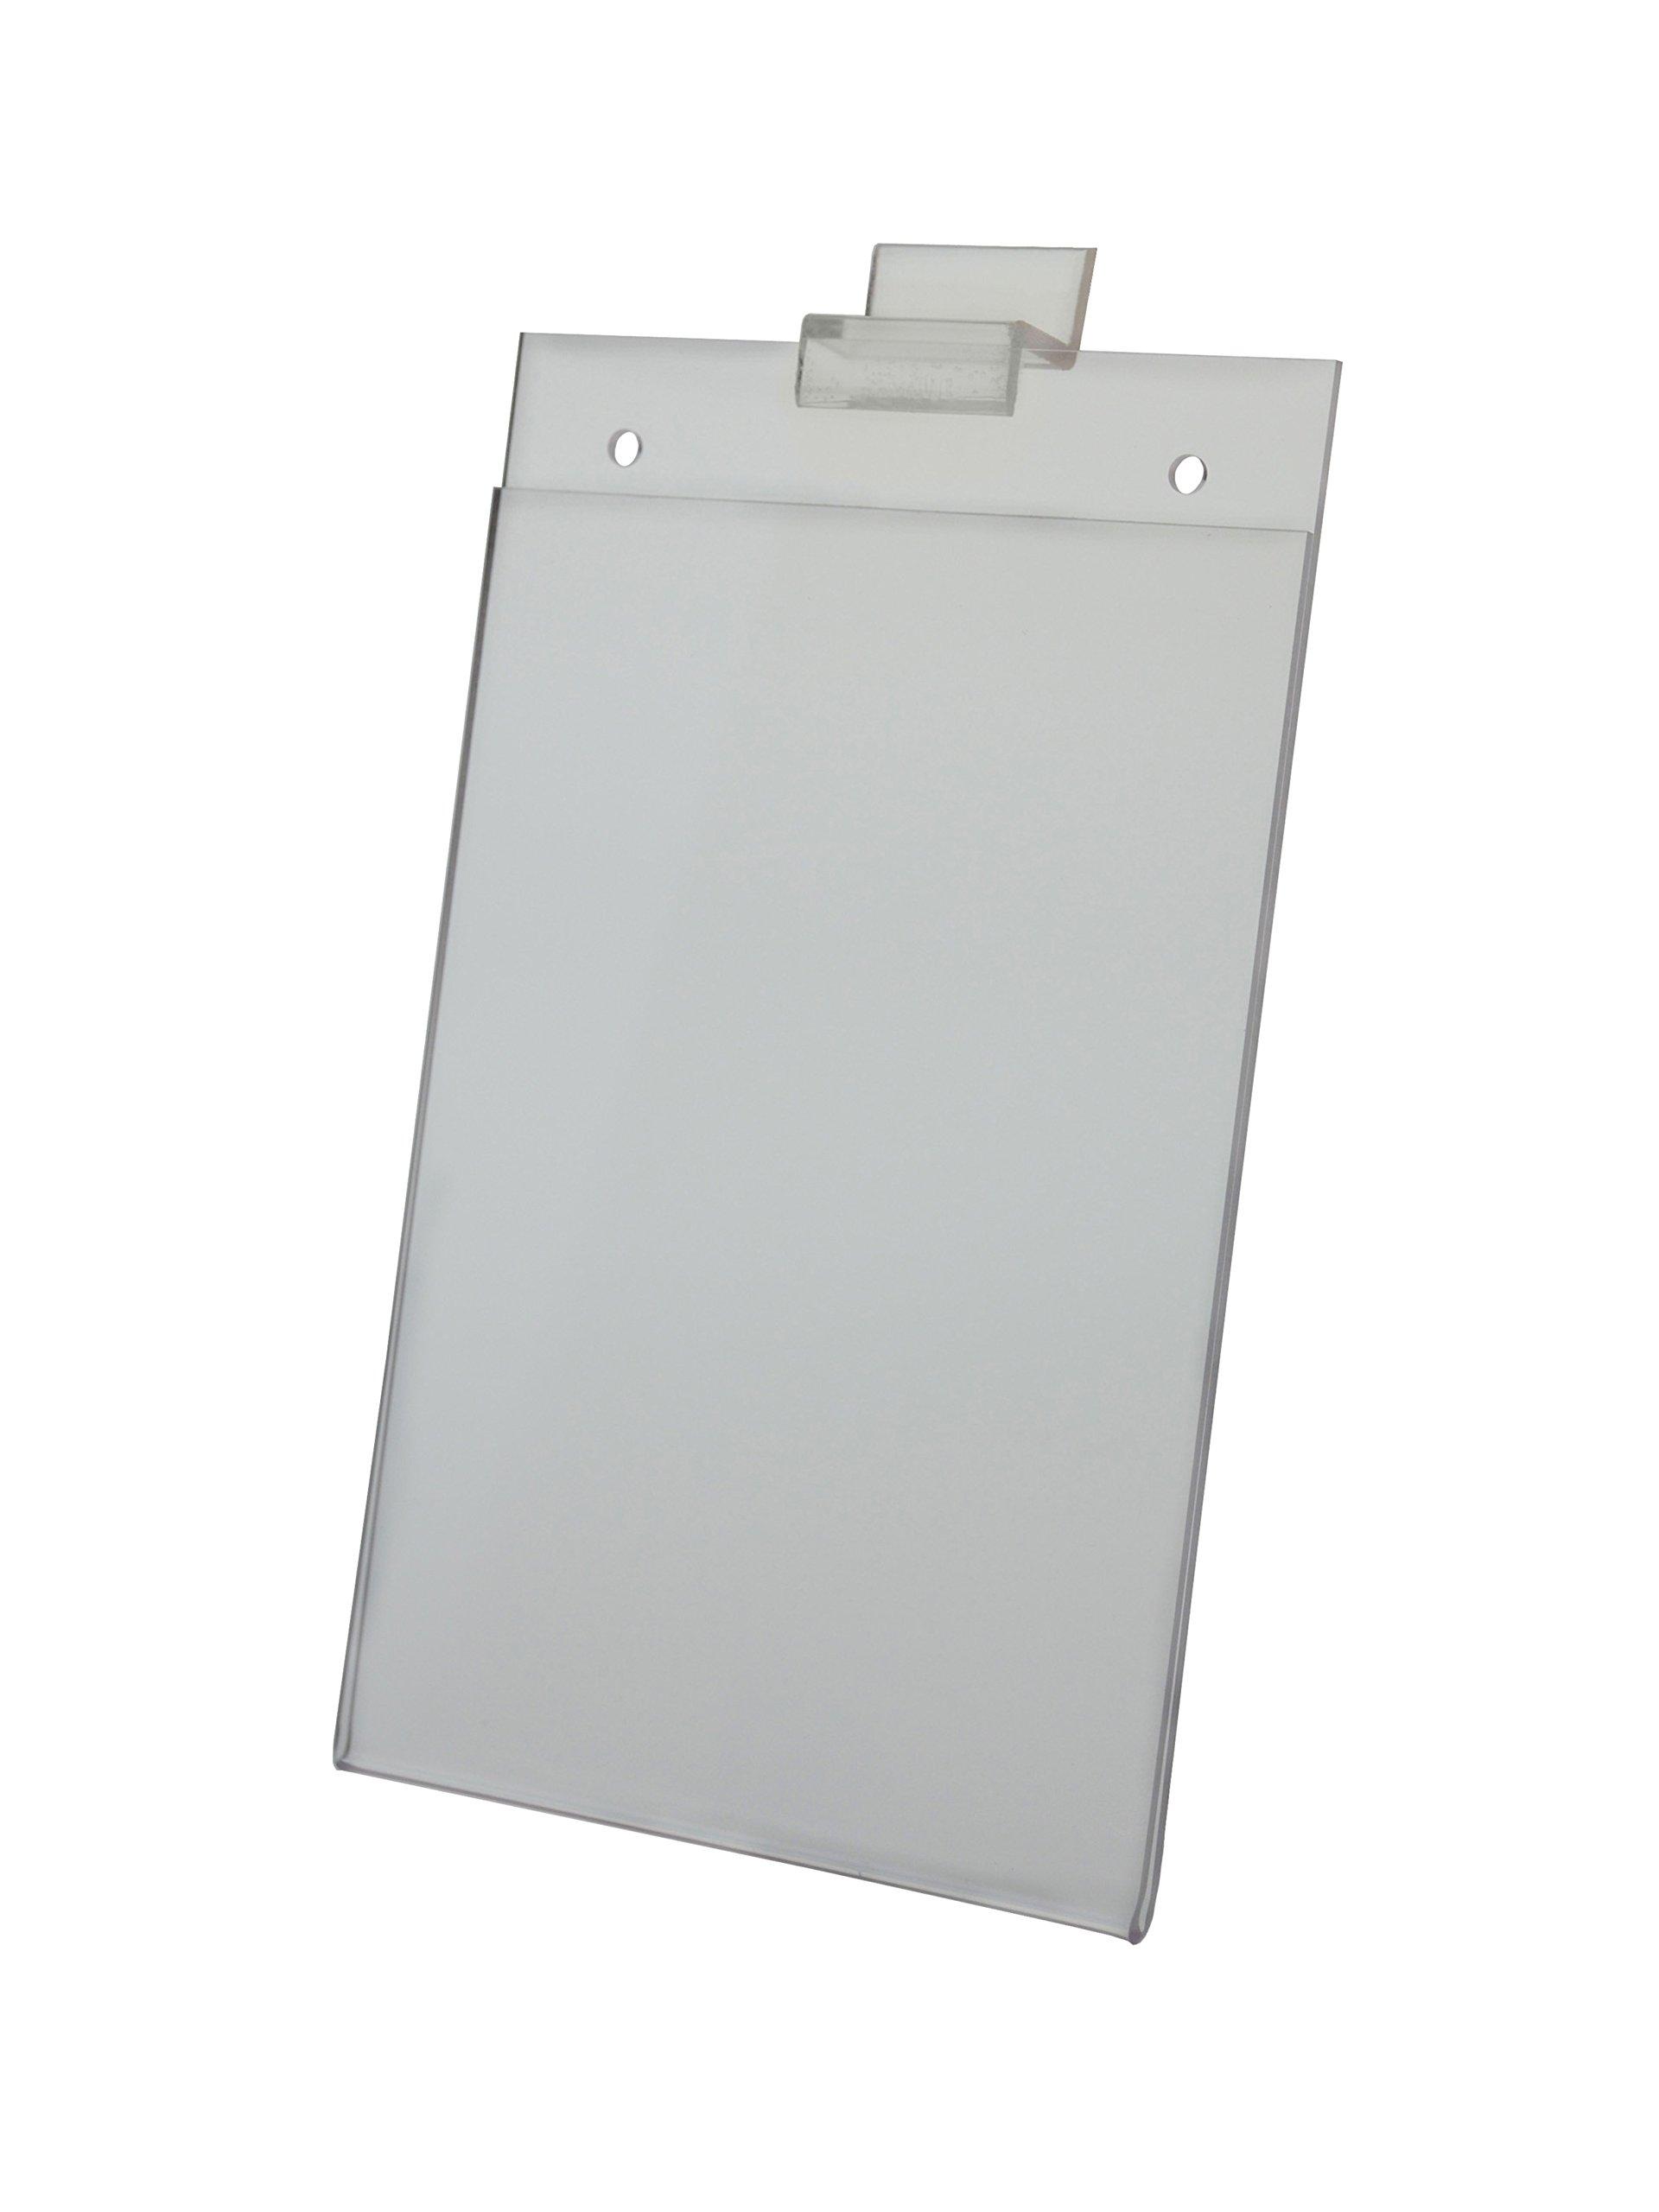 Acrylic Signholder 5-1/2''H x 7''W For Slatwall - Box Of 12 Slat Sign Holders